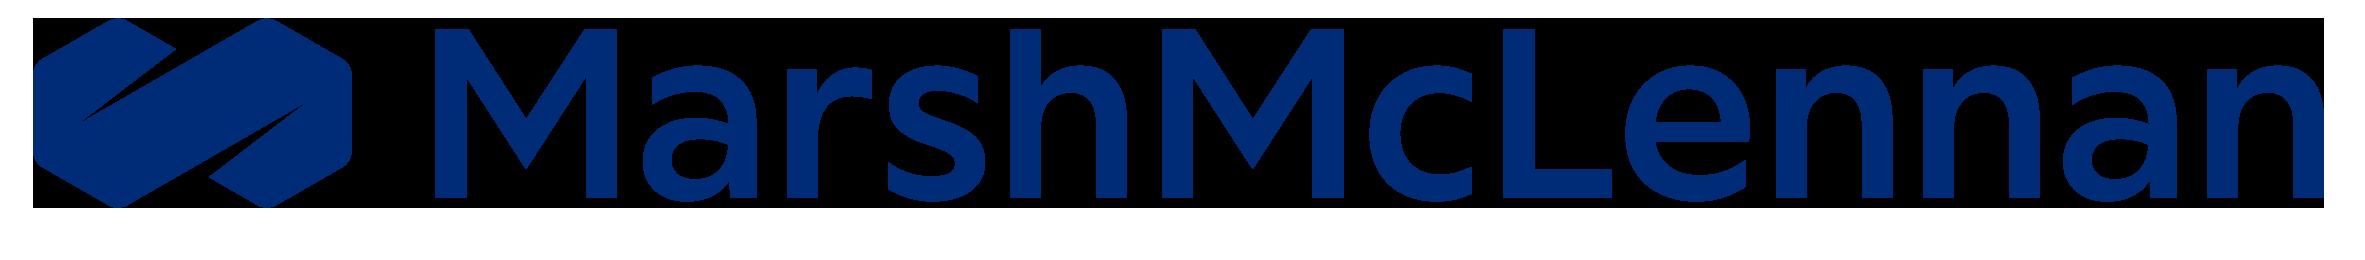 Logotipo MARSH & MCLENNAN COMPANIES